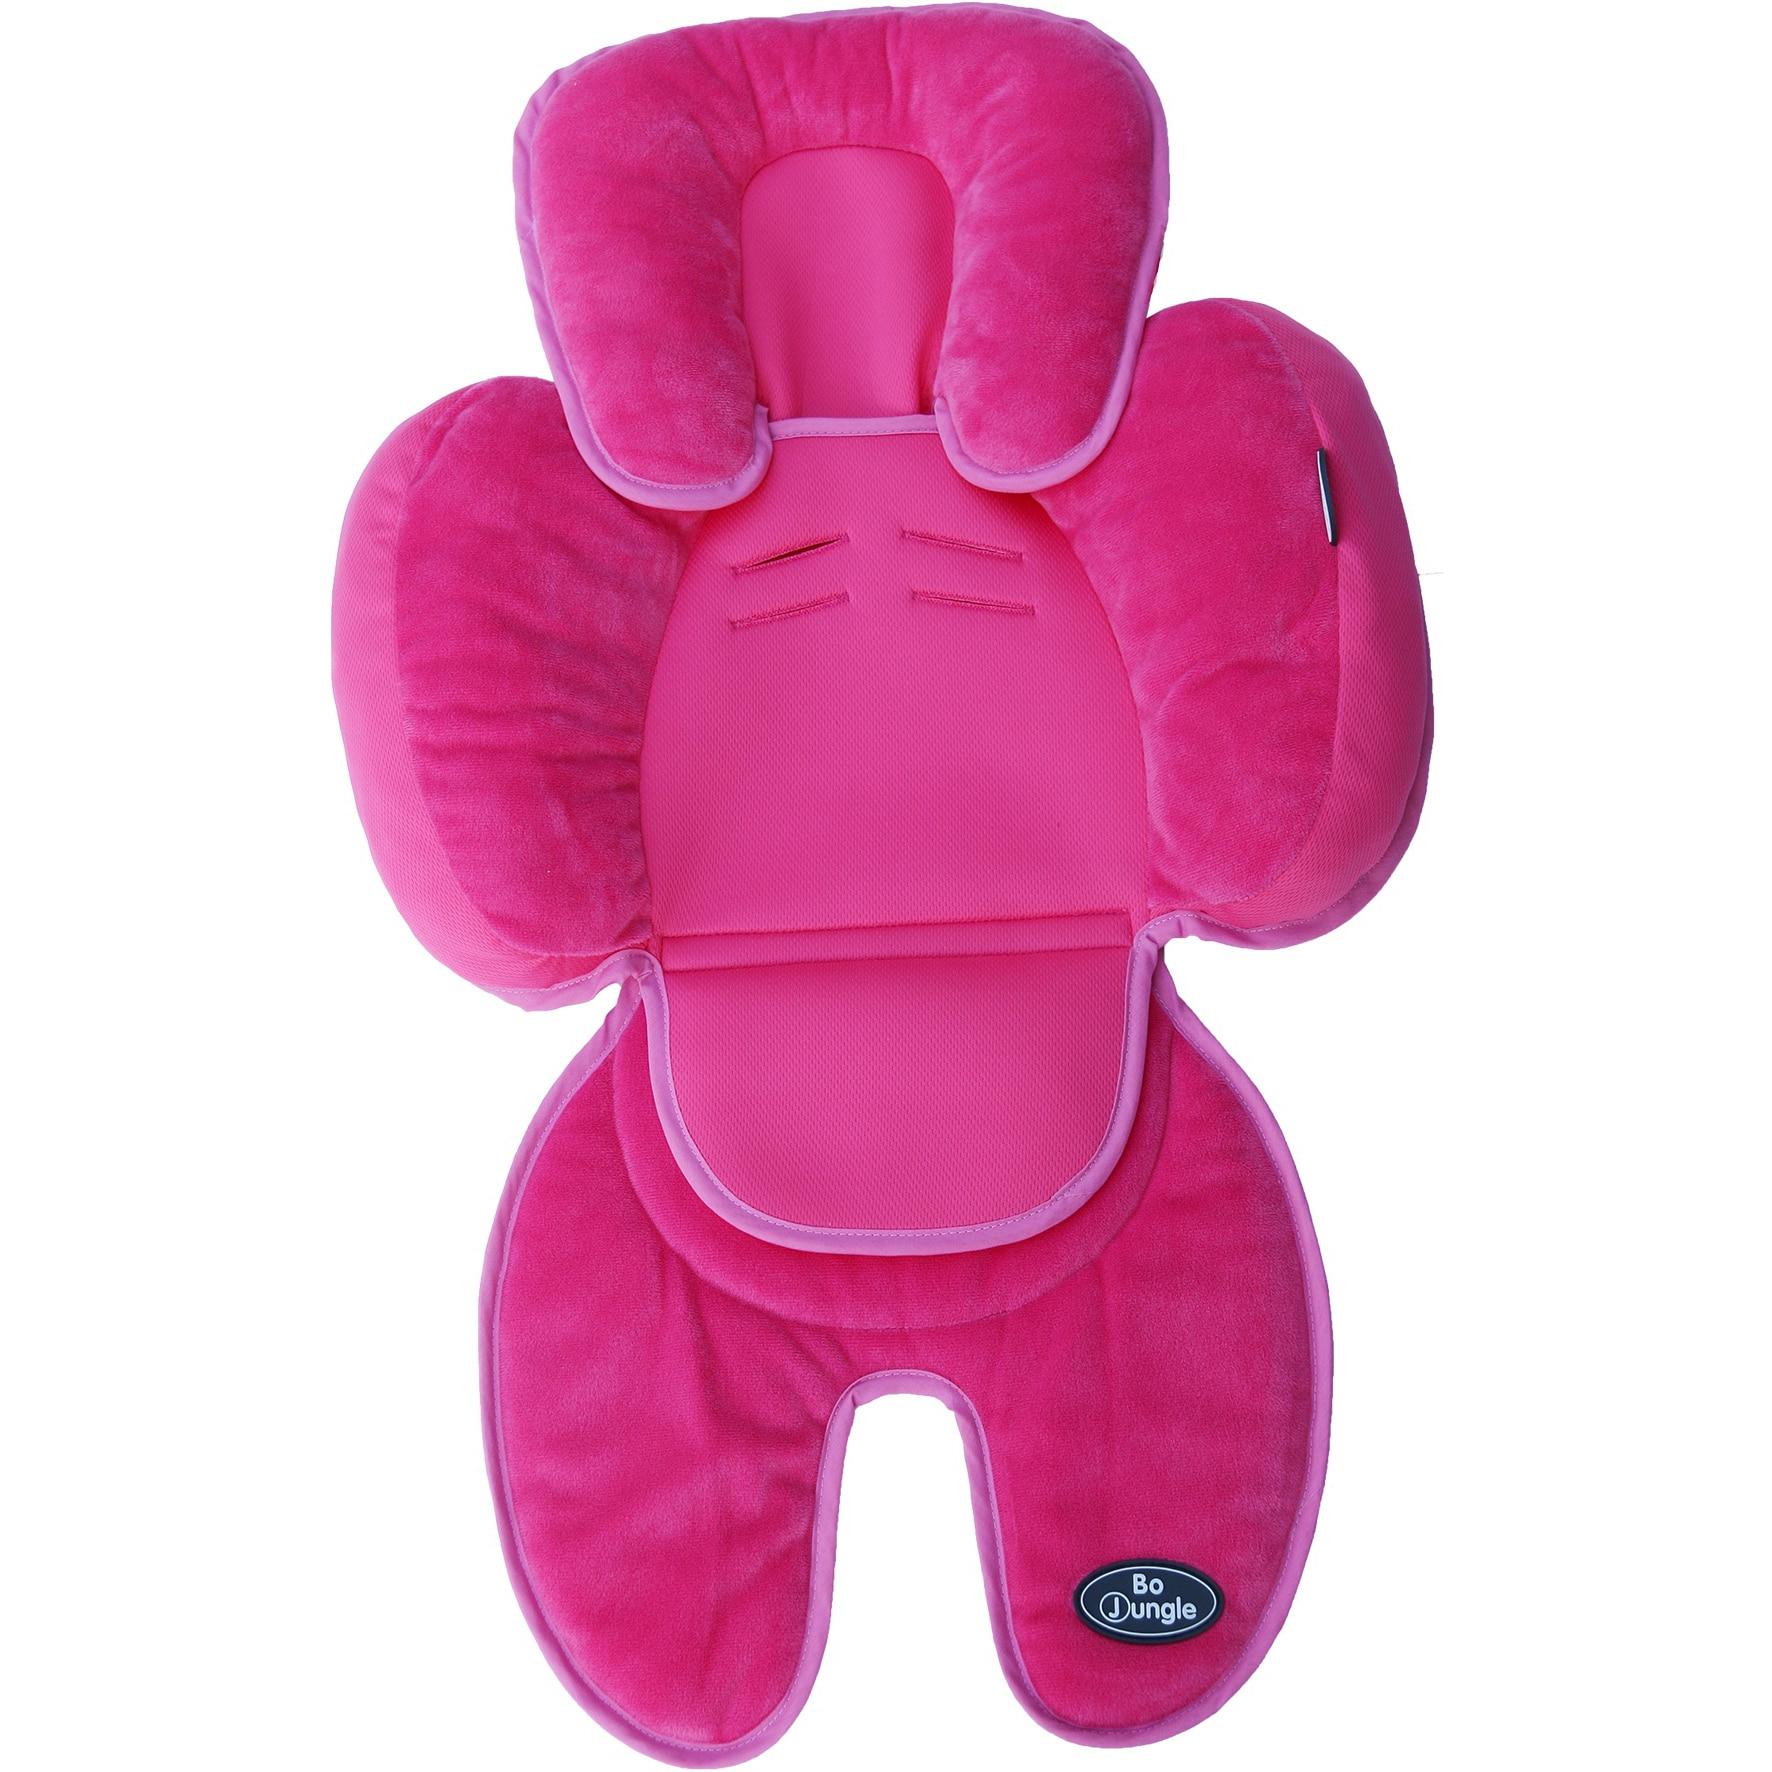 Fotografie Saltea suplimentara bebelusi BO Jungle, 3 in 1 pentru carucior, scaun auto, scoica, roz